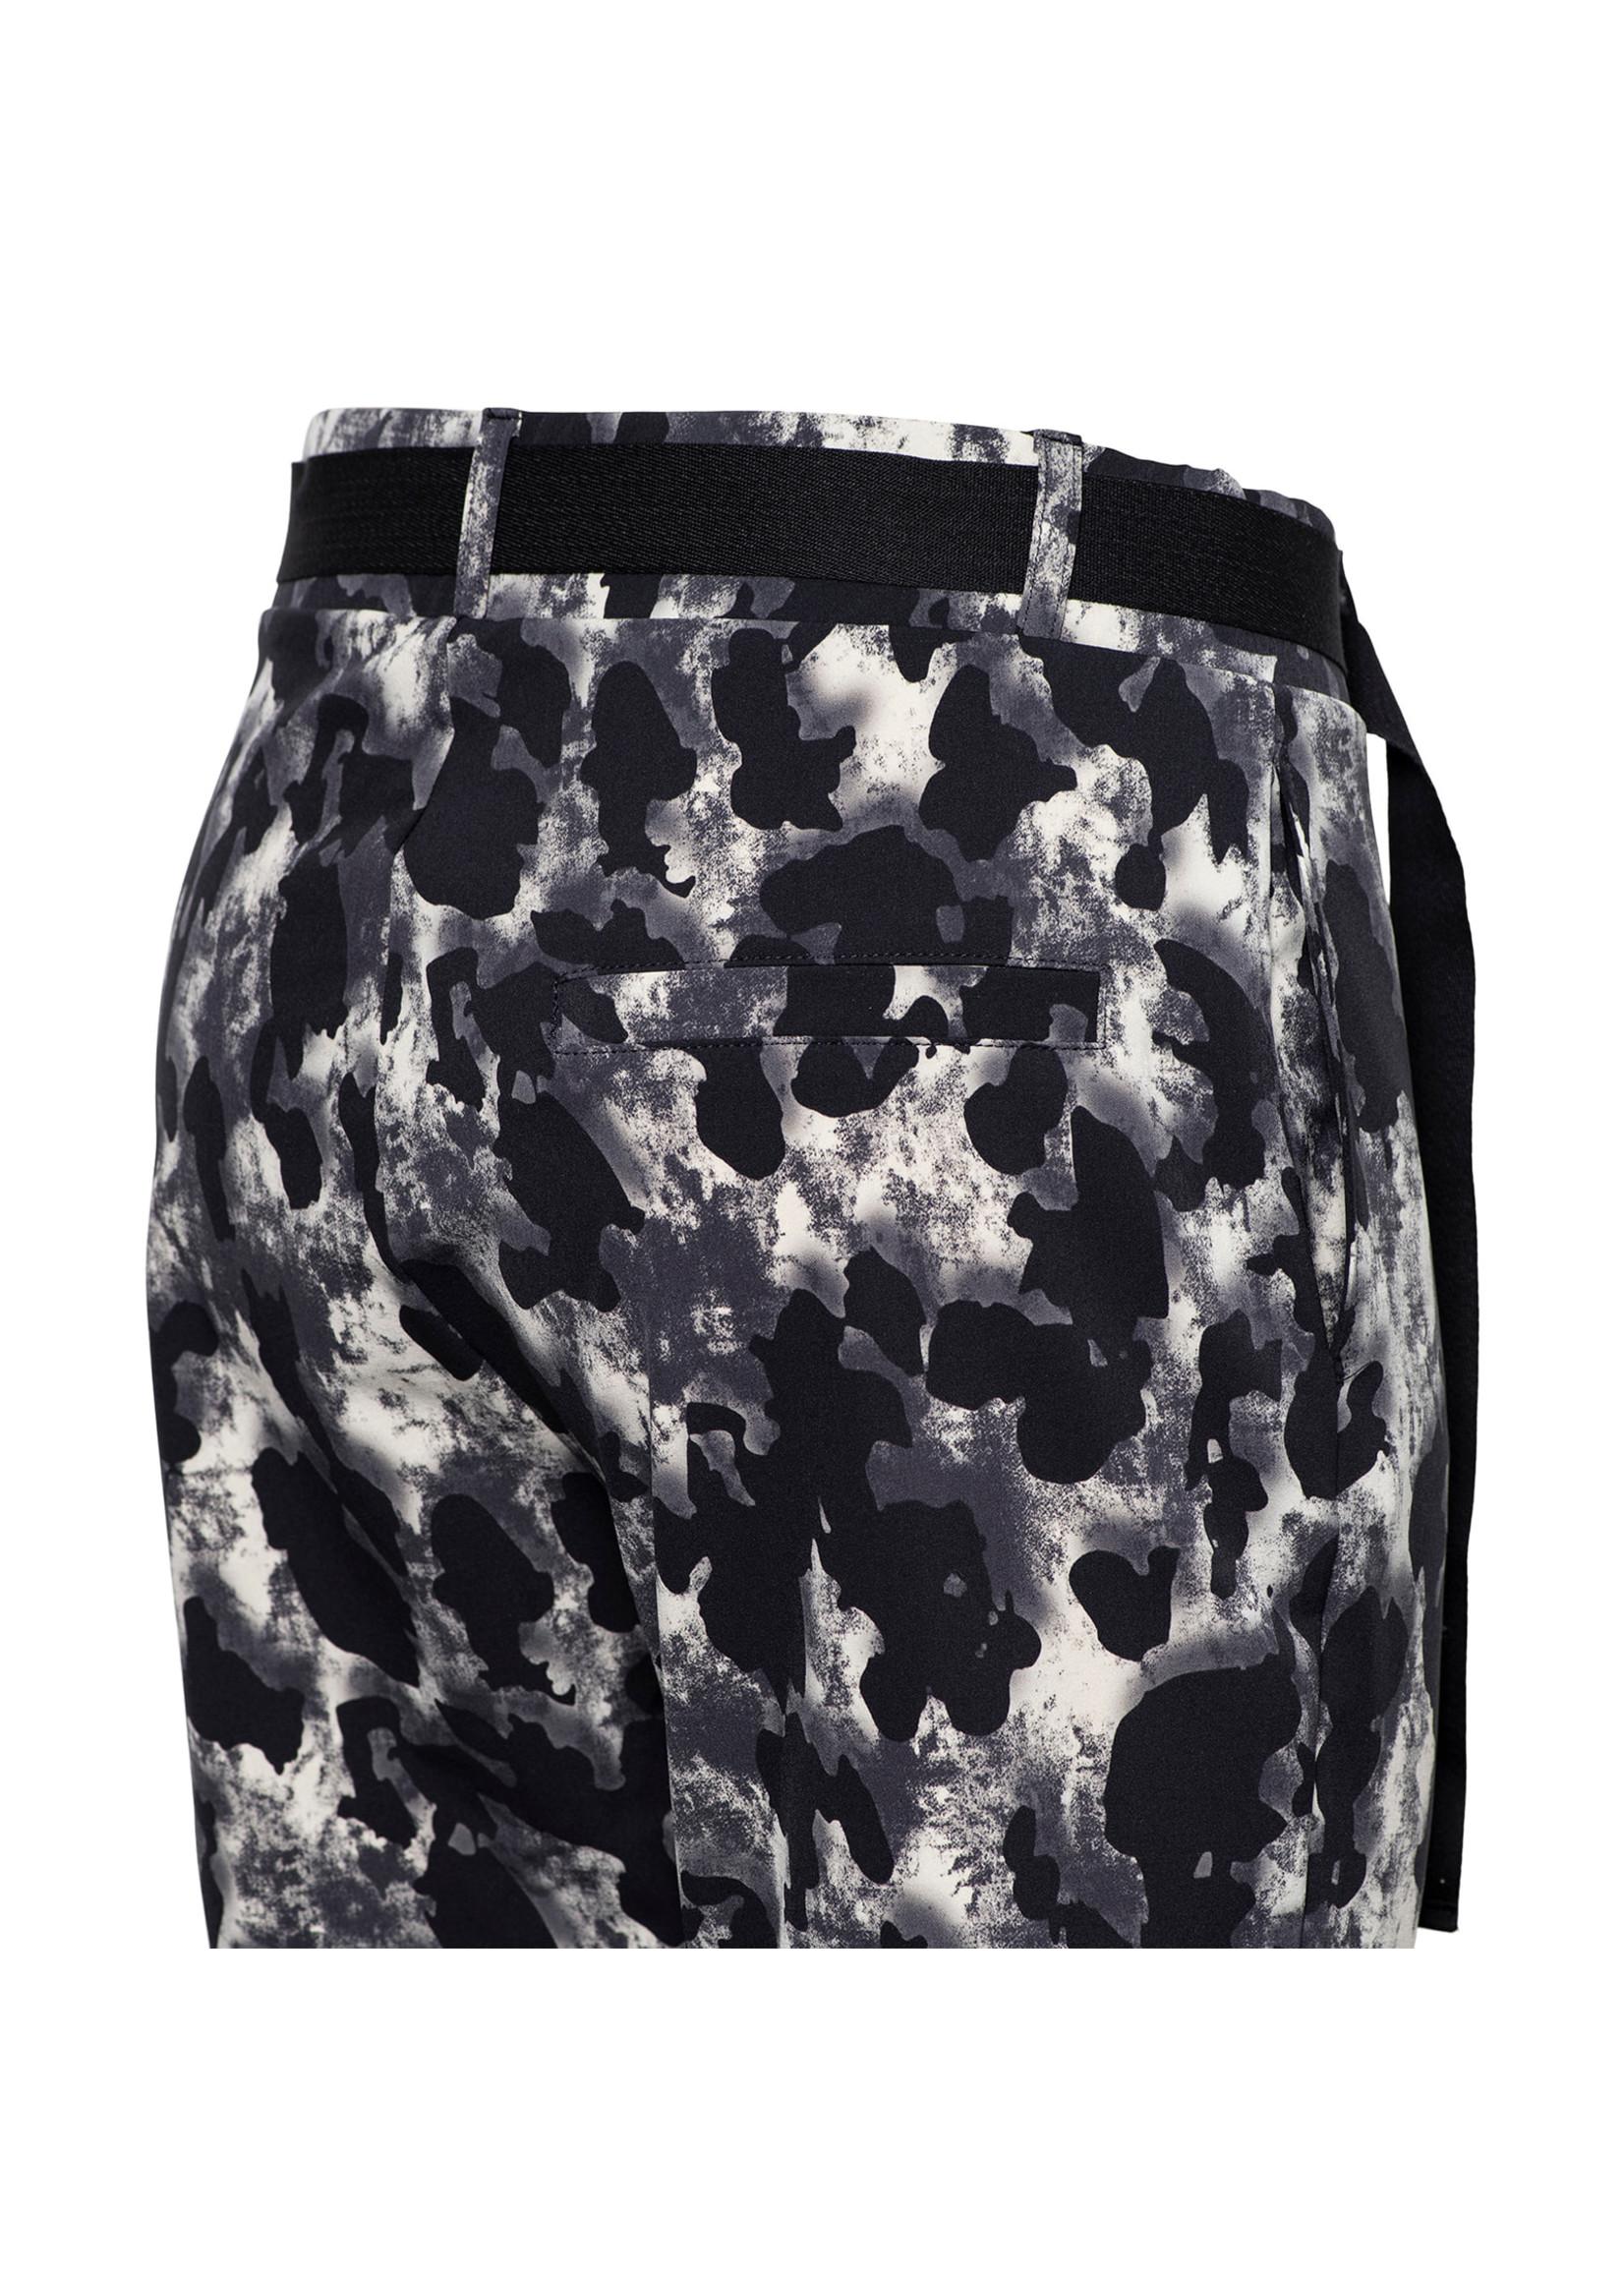 &Co Women polly jogger black spot (m.black)